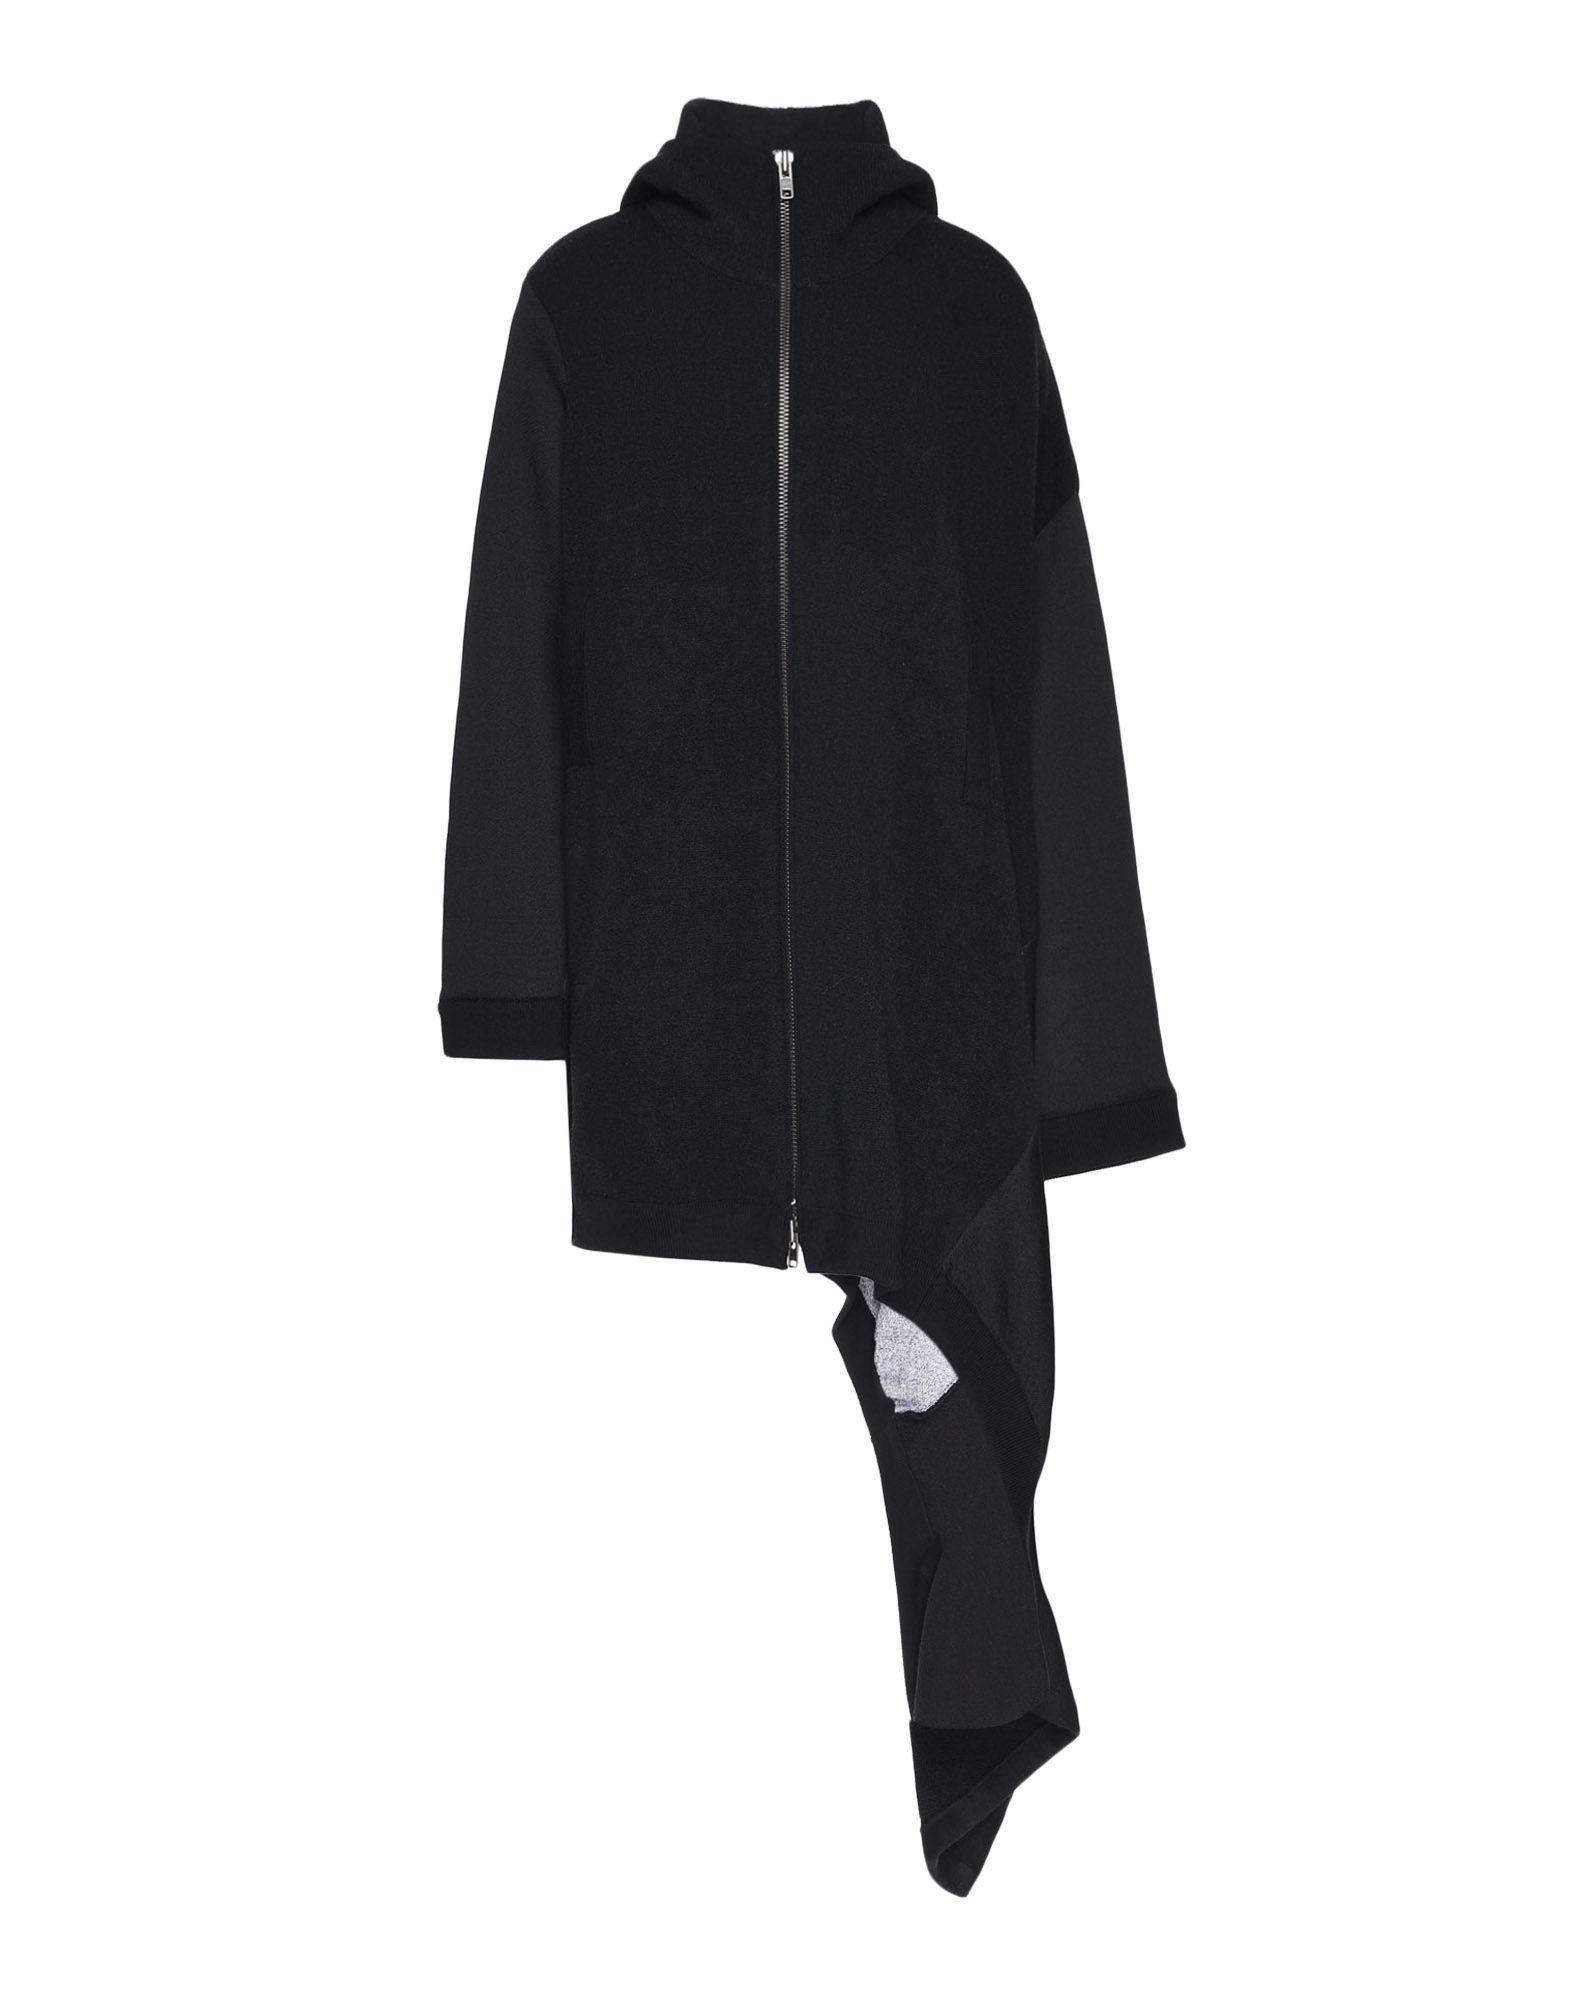 Y-3 Y-3 Knitted Hoodie Dress Vestito corto Donna f